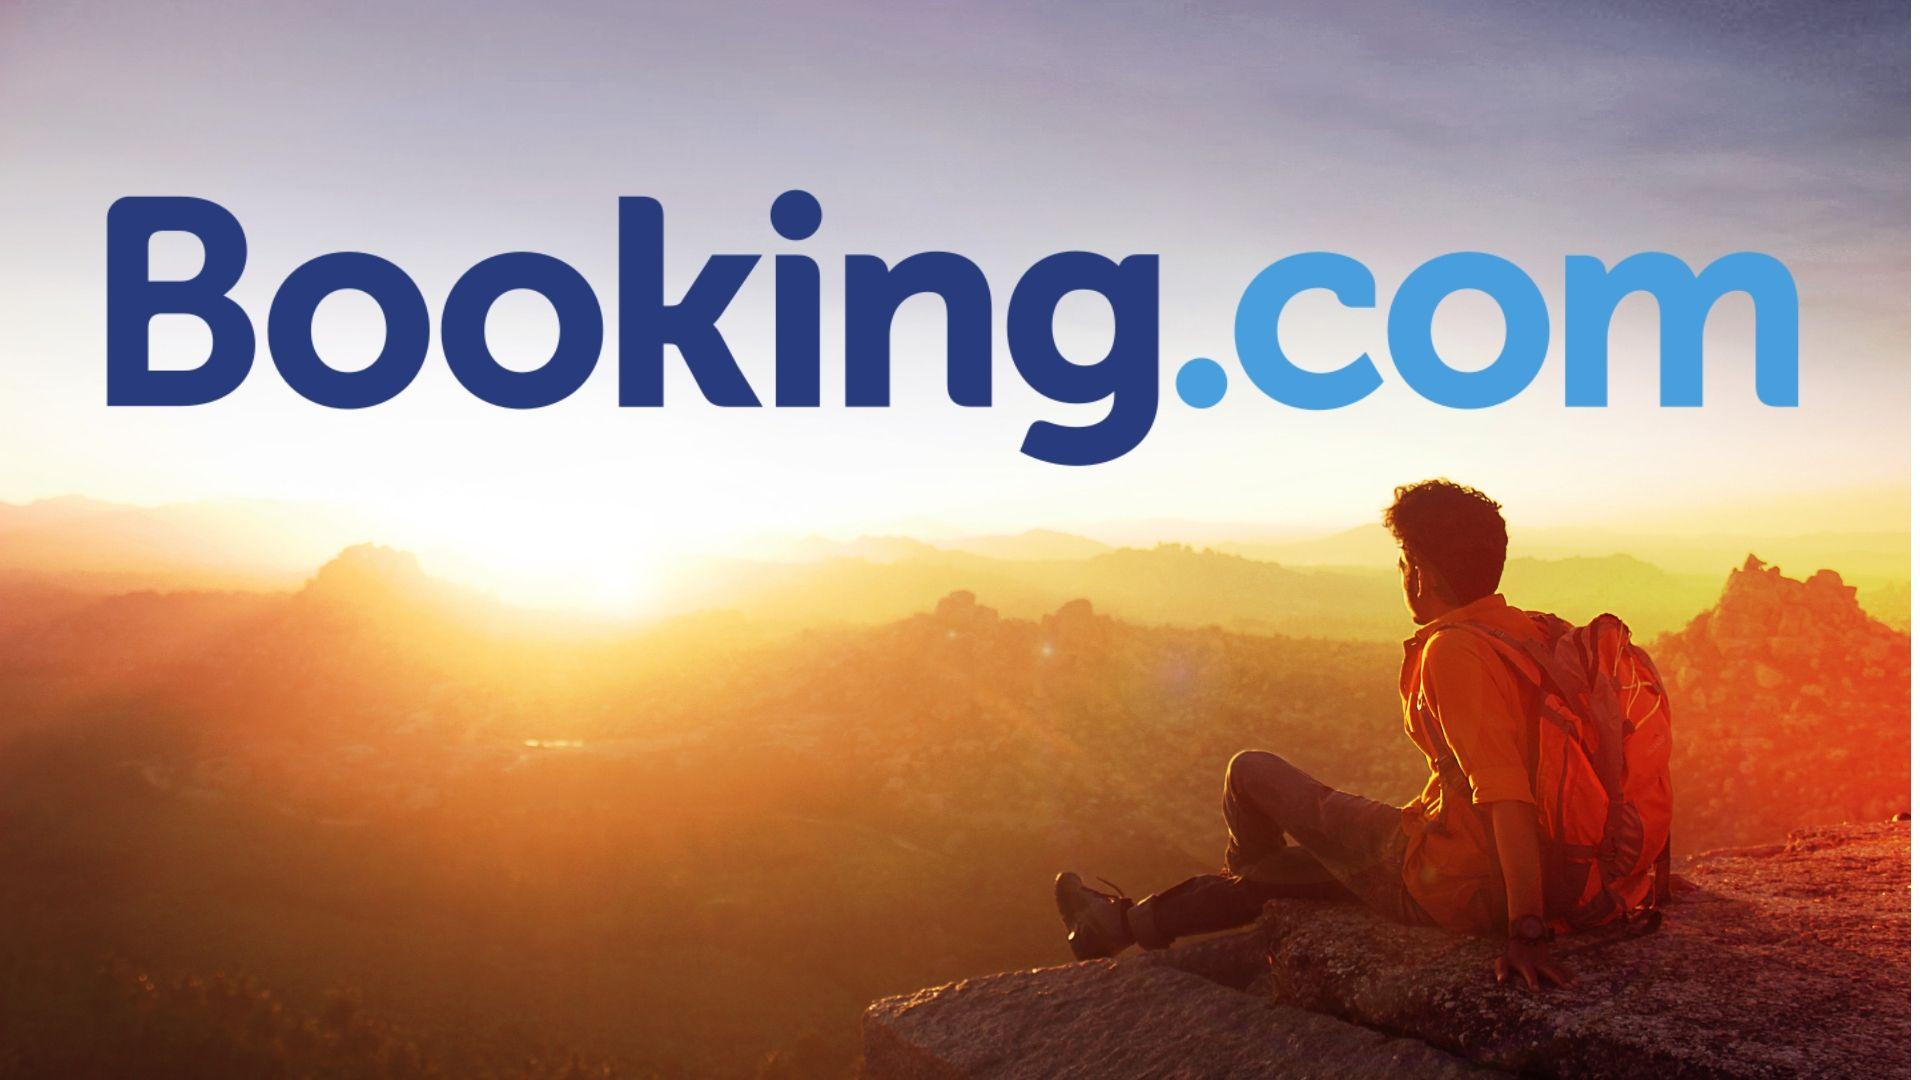 Booking.com Opportunities